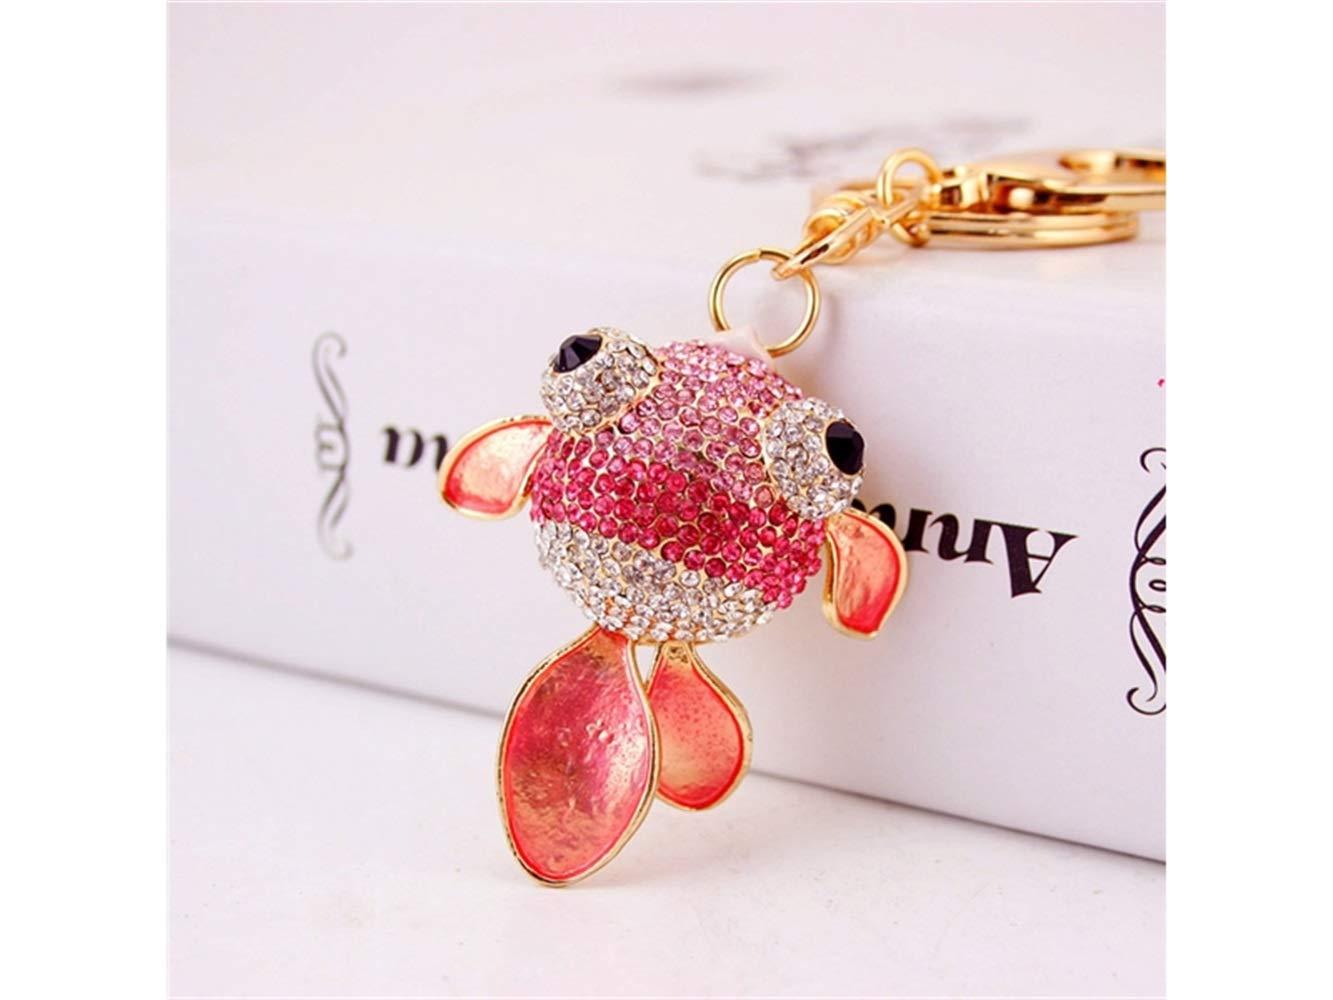 Car Keychain, Cute Diamond Goldfish Keychain Animal Key Trinket Car Bag Key Holder Decorations(Pink) for Gift